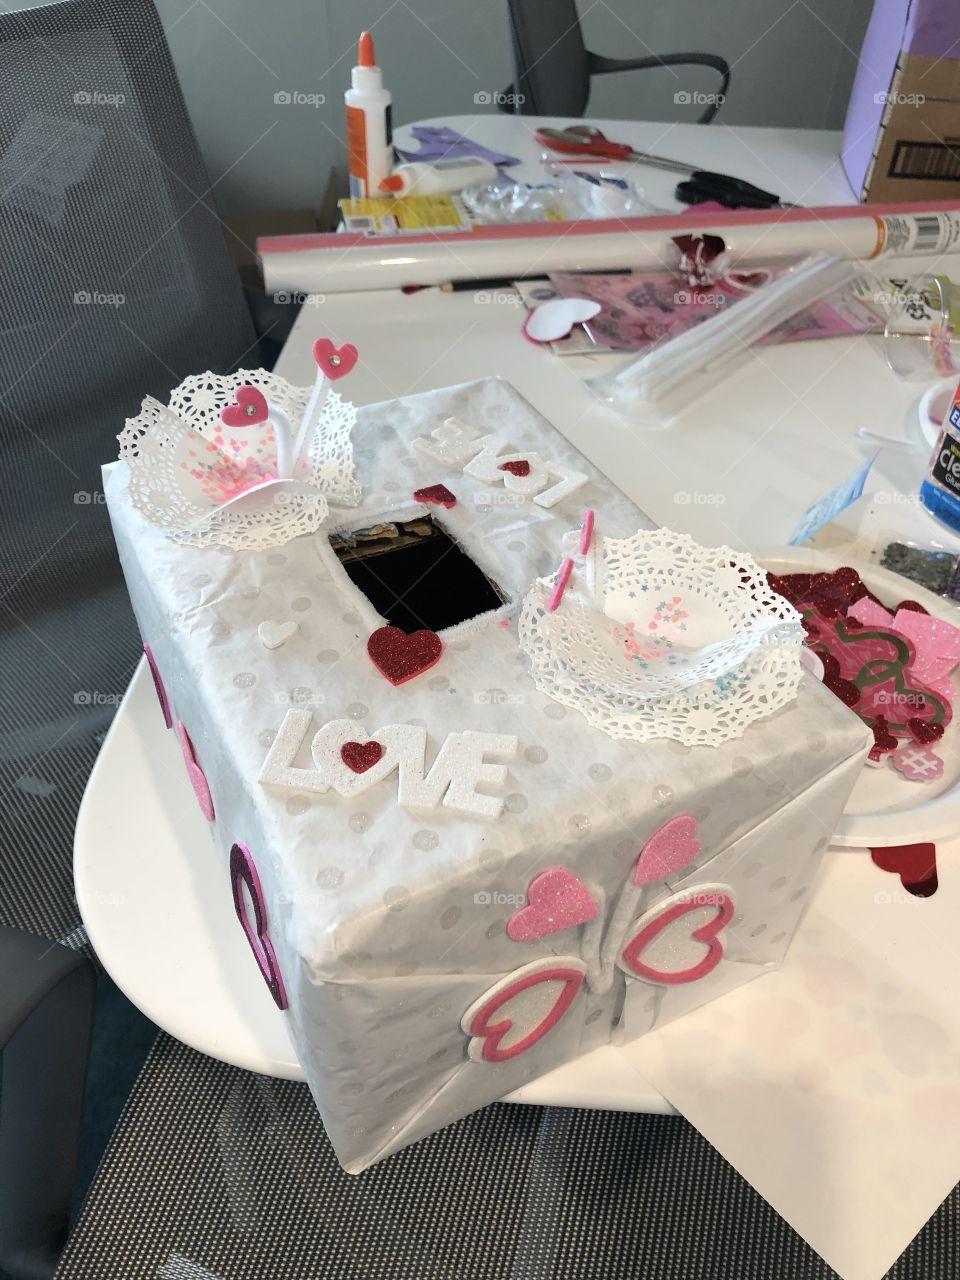 Making Valentine's boxes